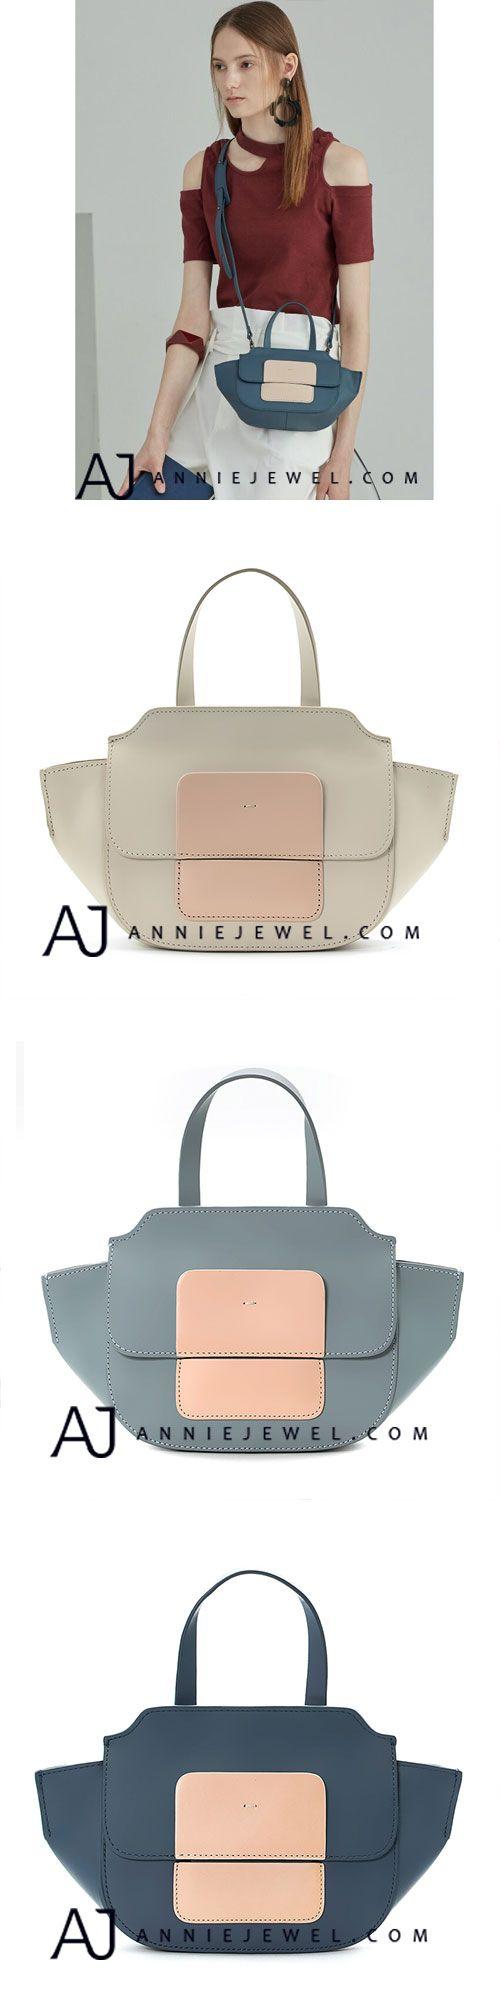 2018 SPRING GENUINE LEATHER HANDBAG BAT PACK PHANTOM BAG SHOULDER BAG CROSS BODY BAG CLUTCH PURSE FOR WOMEN